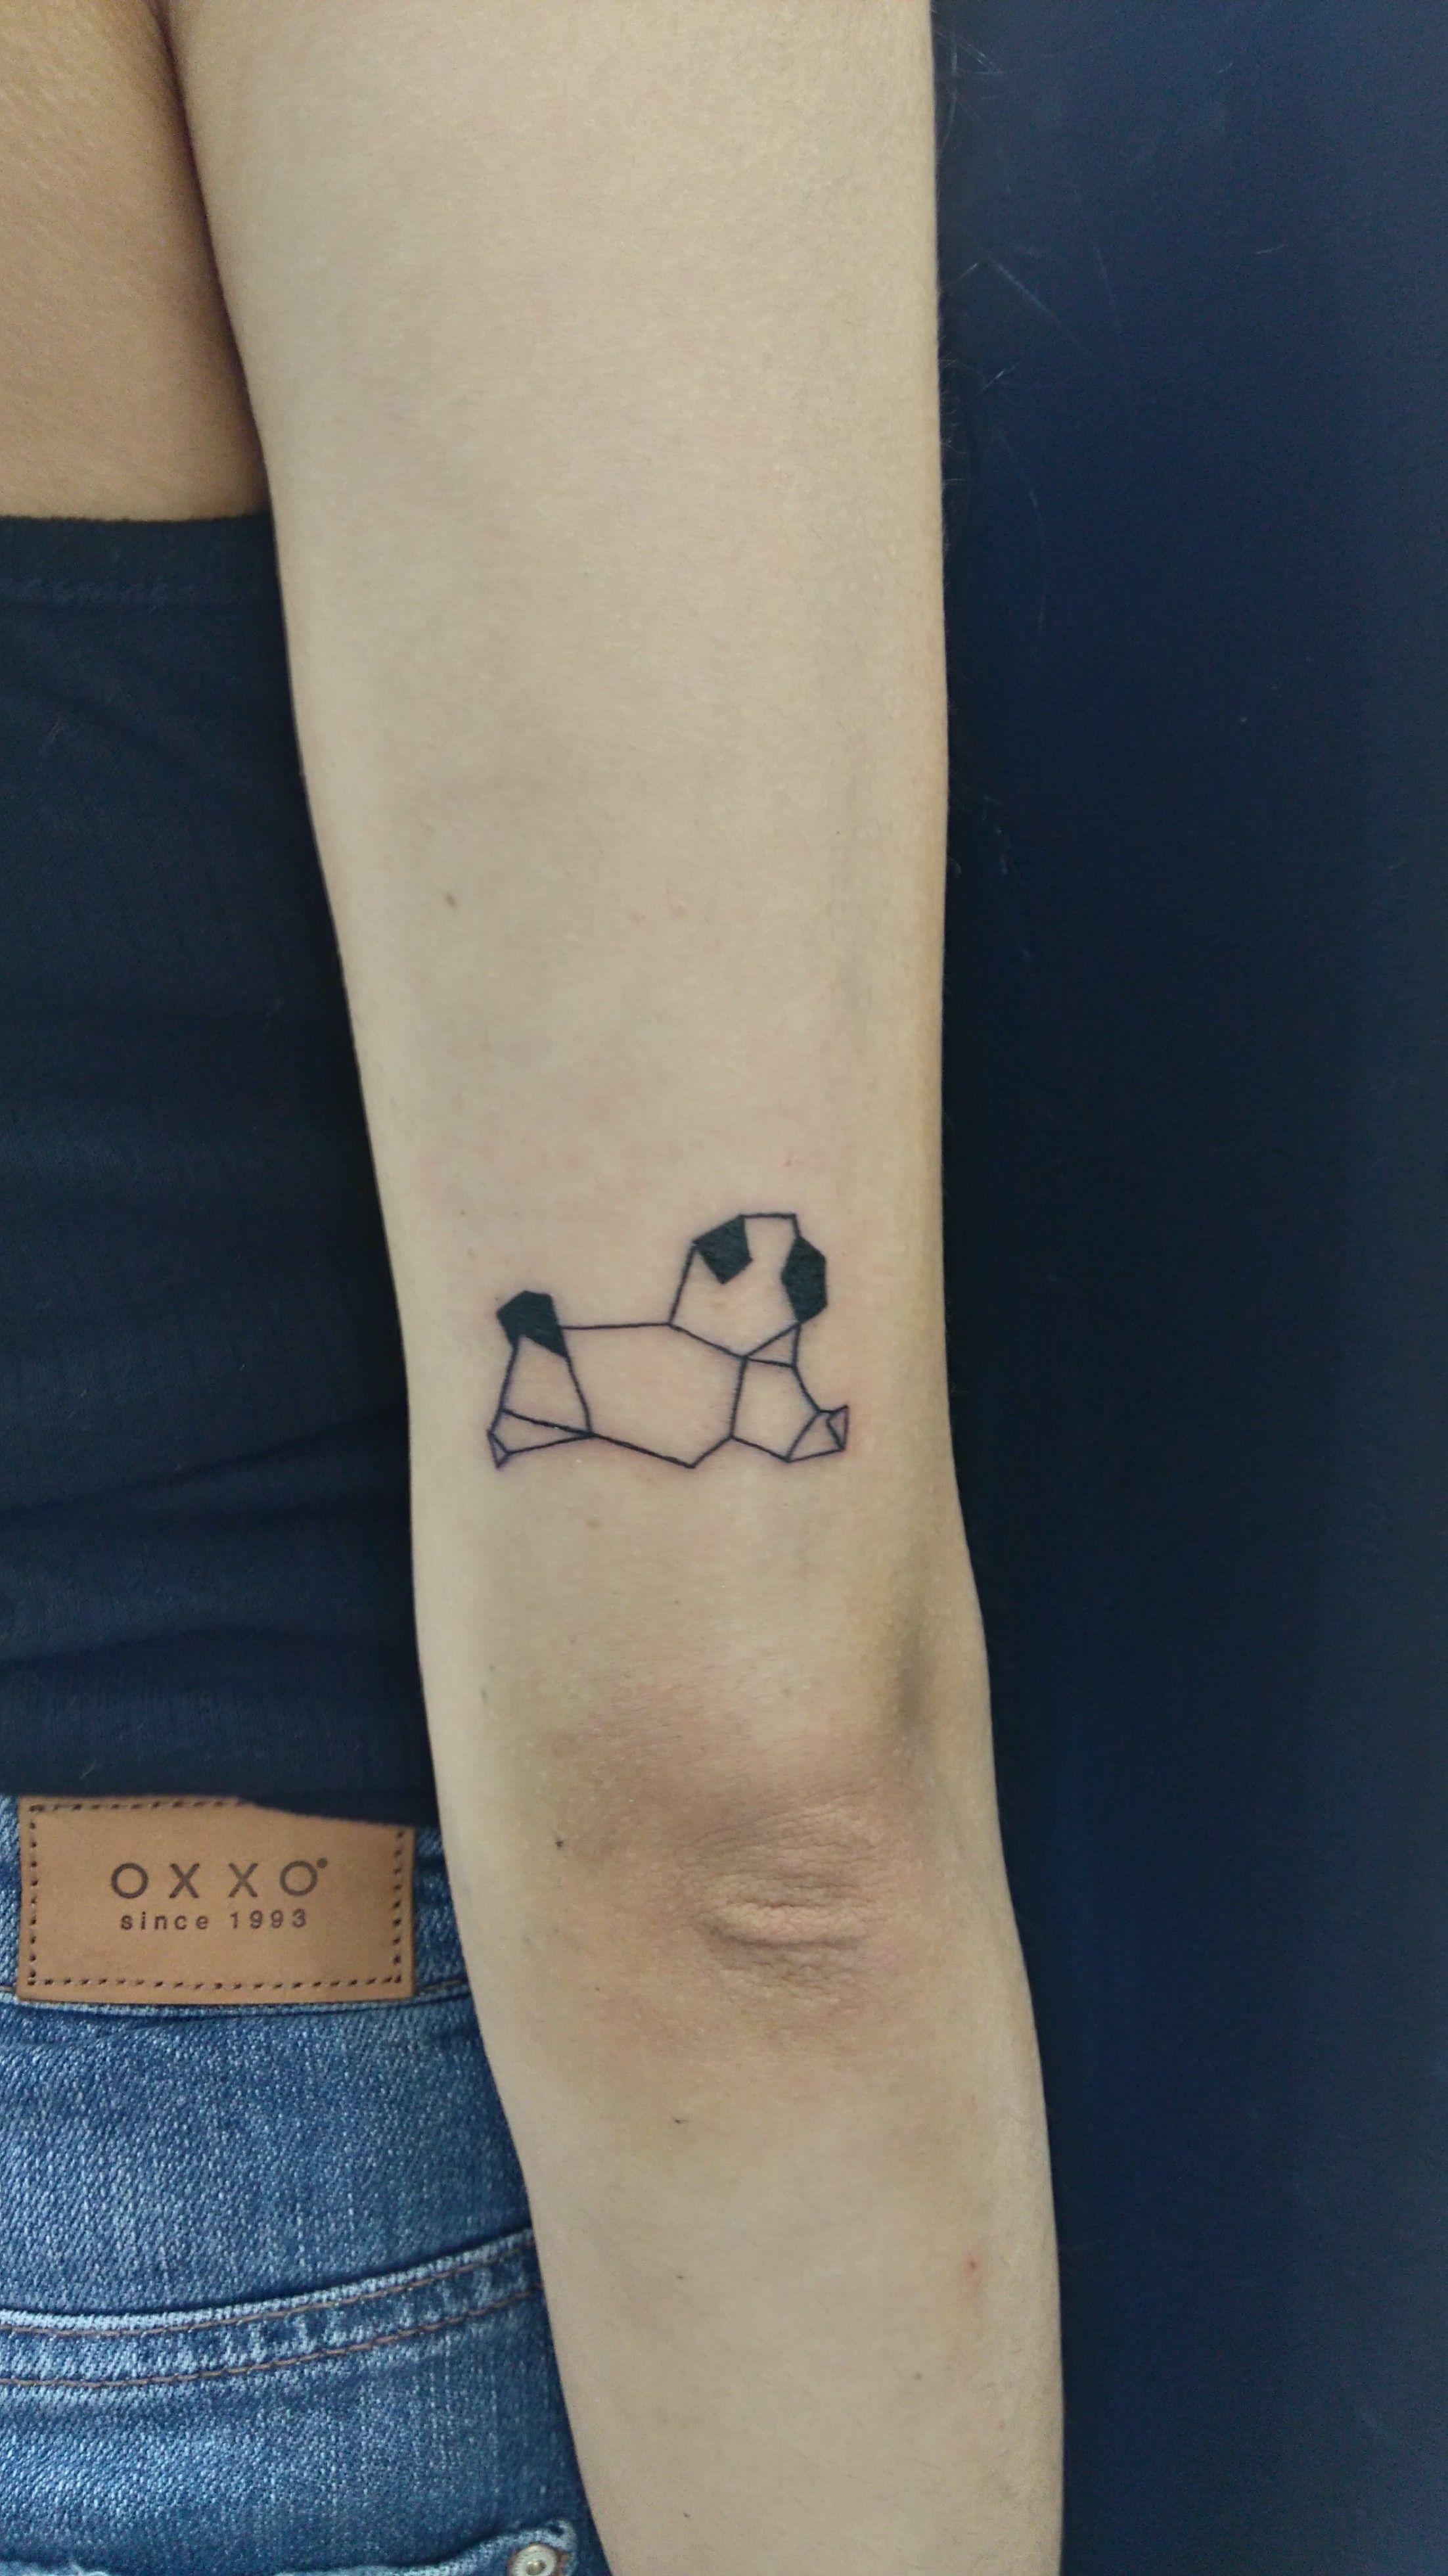 pug dog animals tattoo designs geometric my tattoo works pinterest animal tattoos tattoo. Black Bedroom Furniture Sets. Home Design Ideas